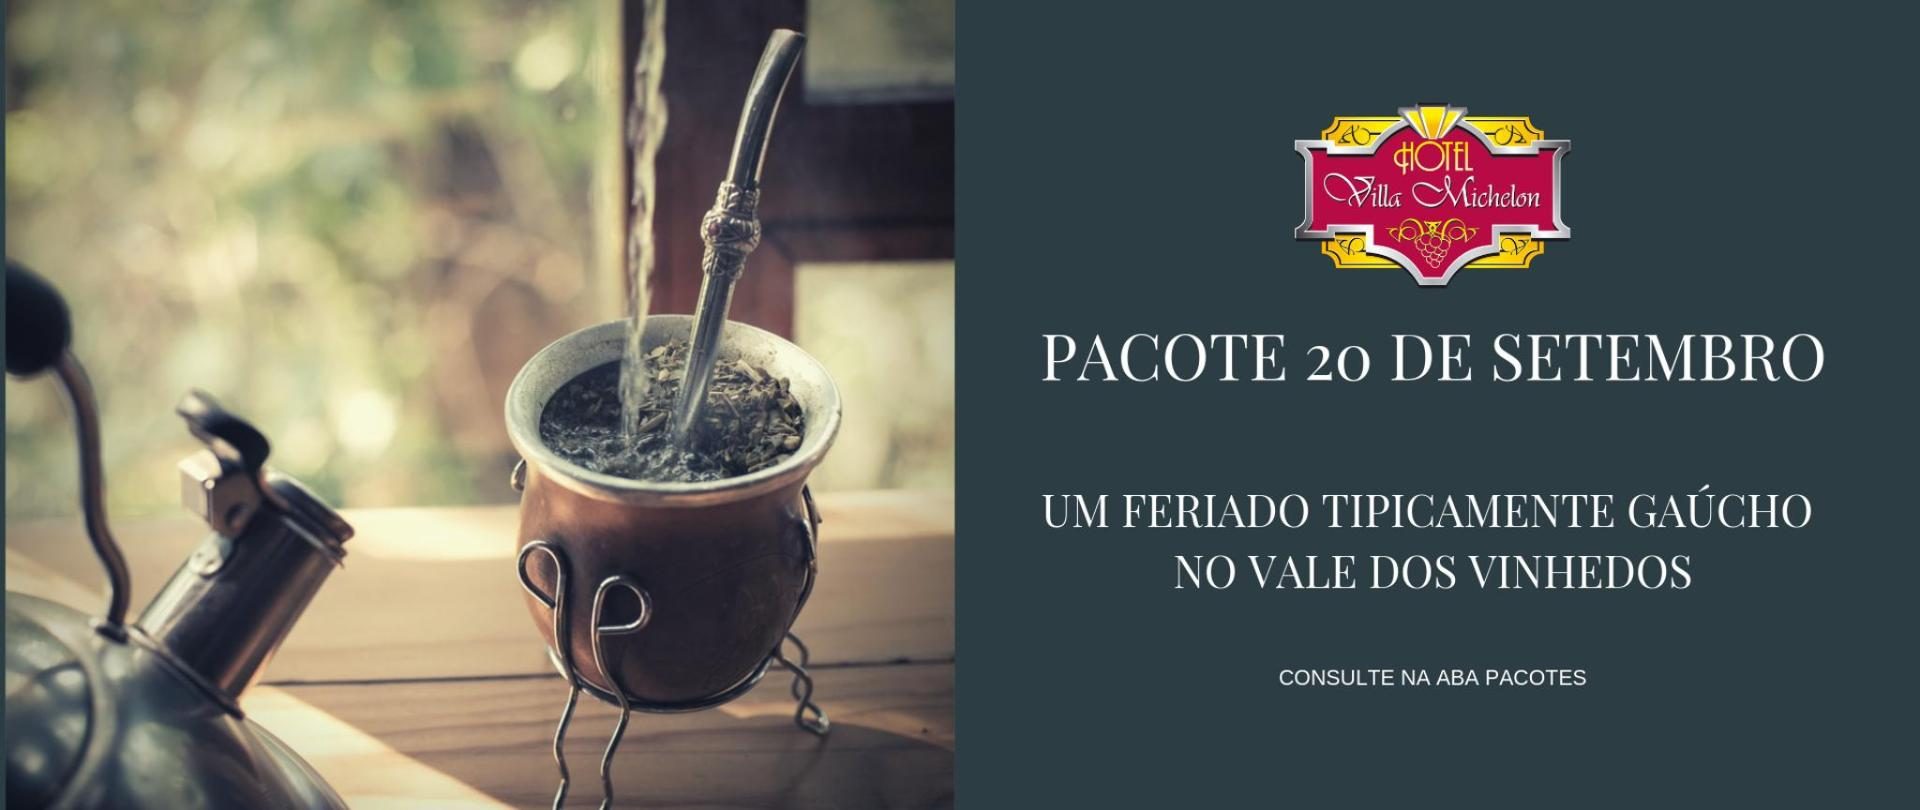 20 DE SETEMBRO.png